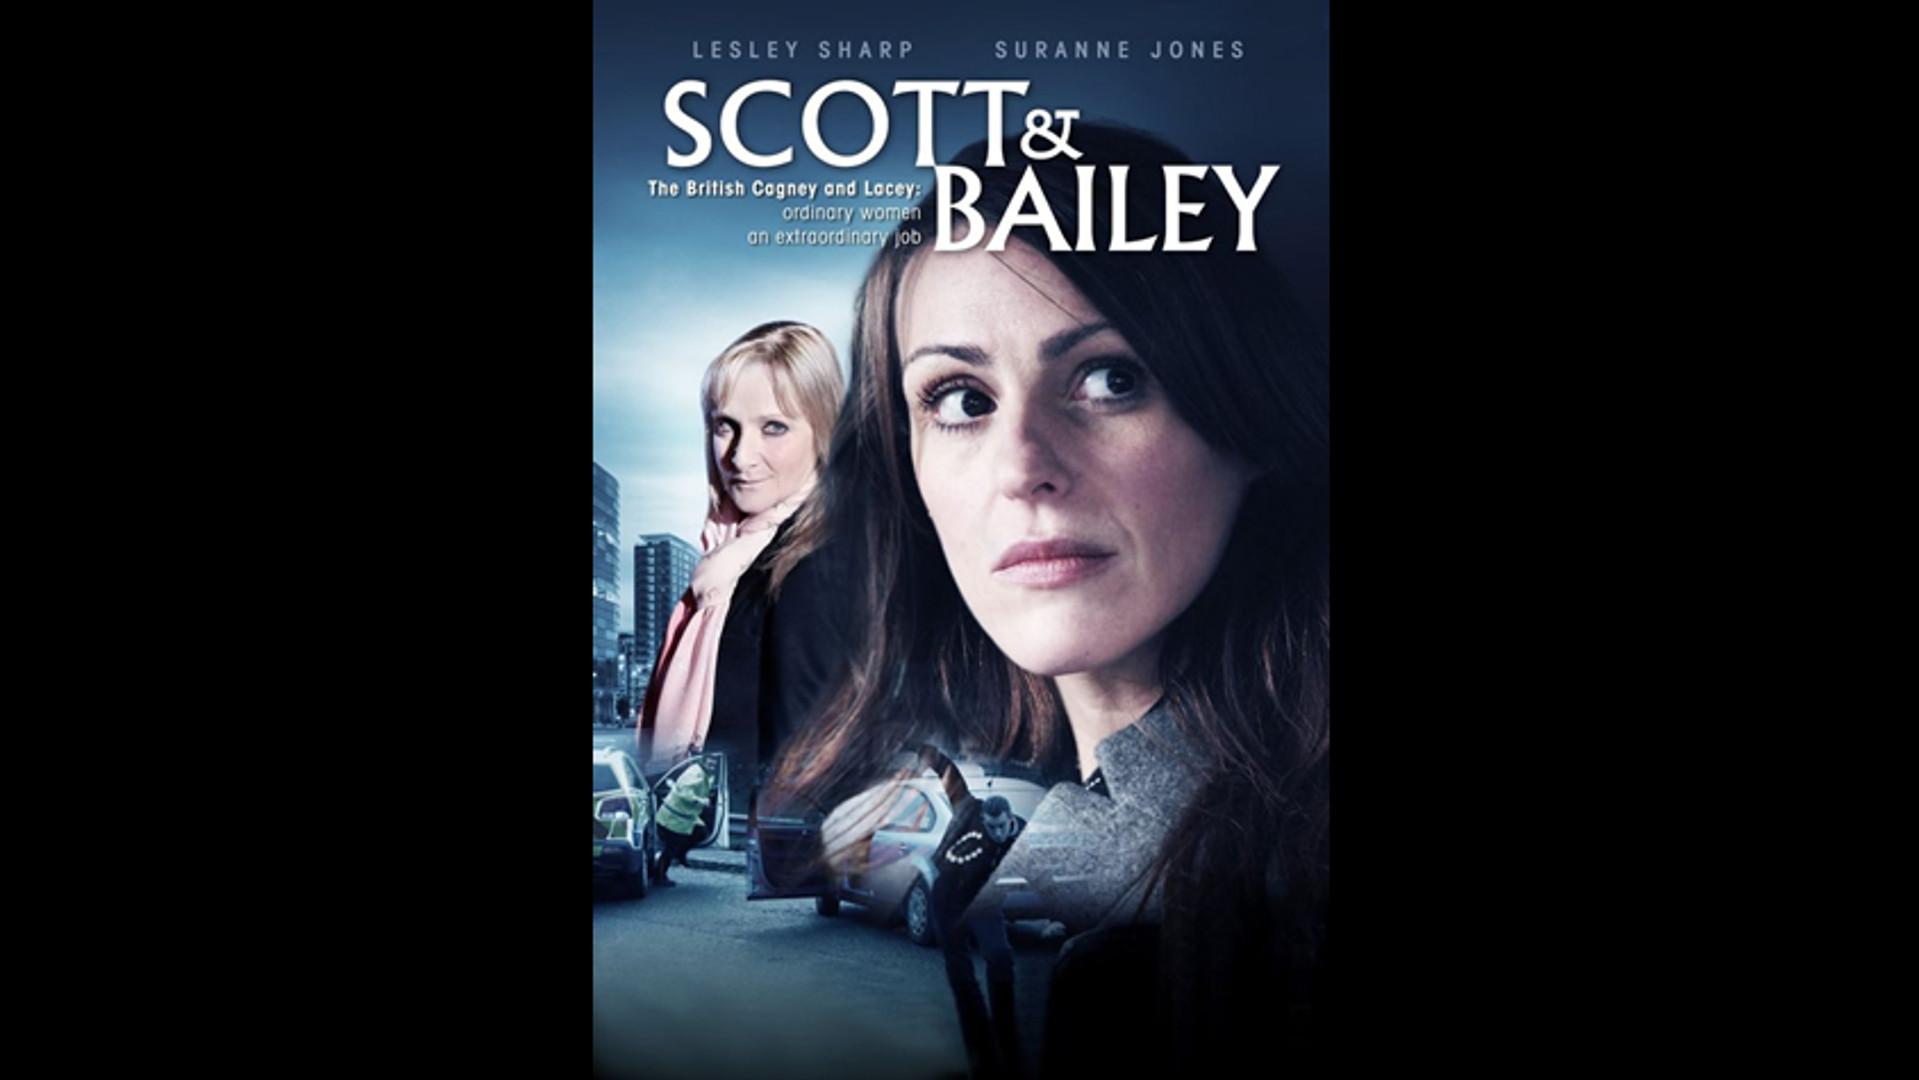 british-director-of-photography-scott-bailey